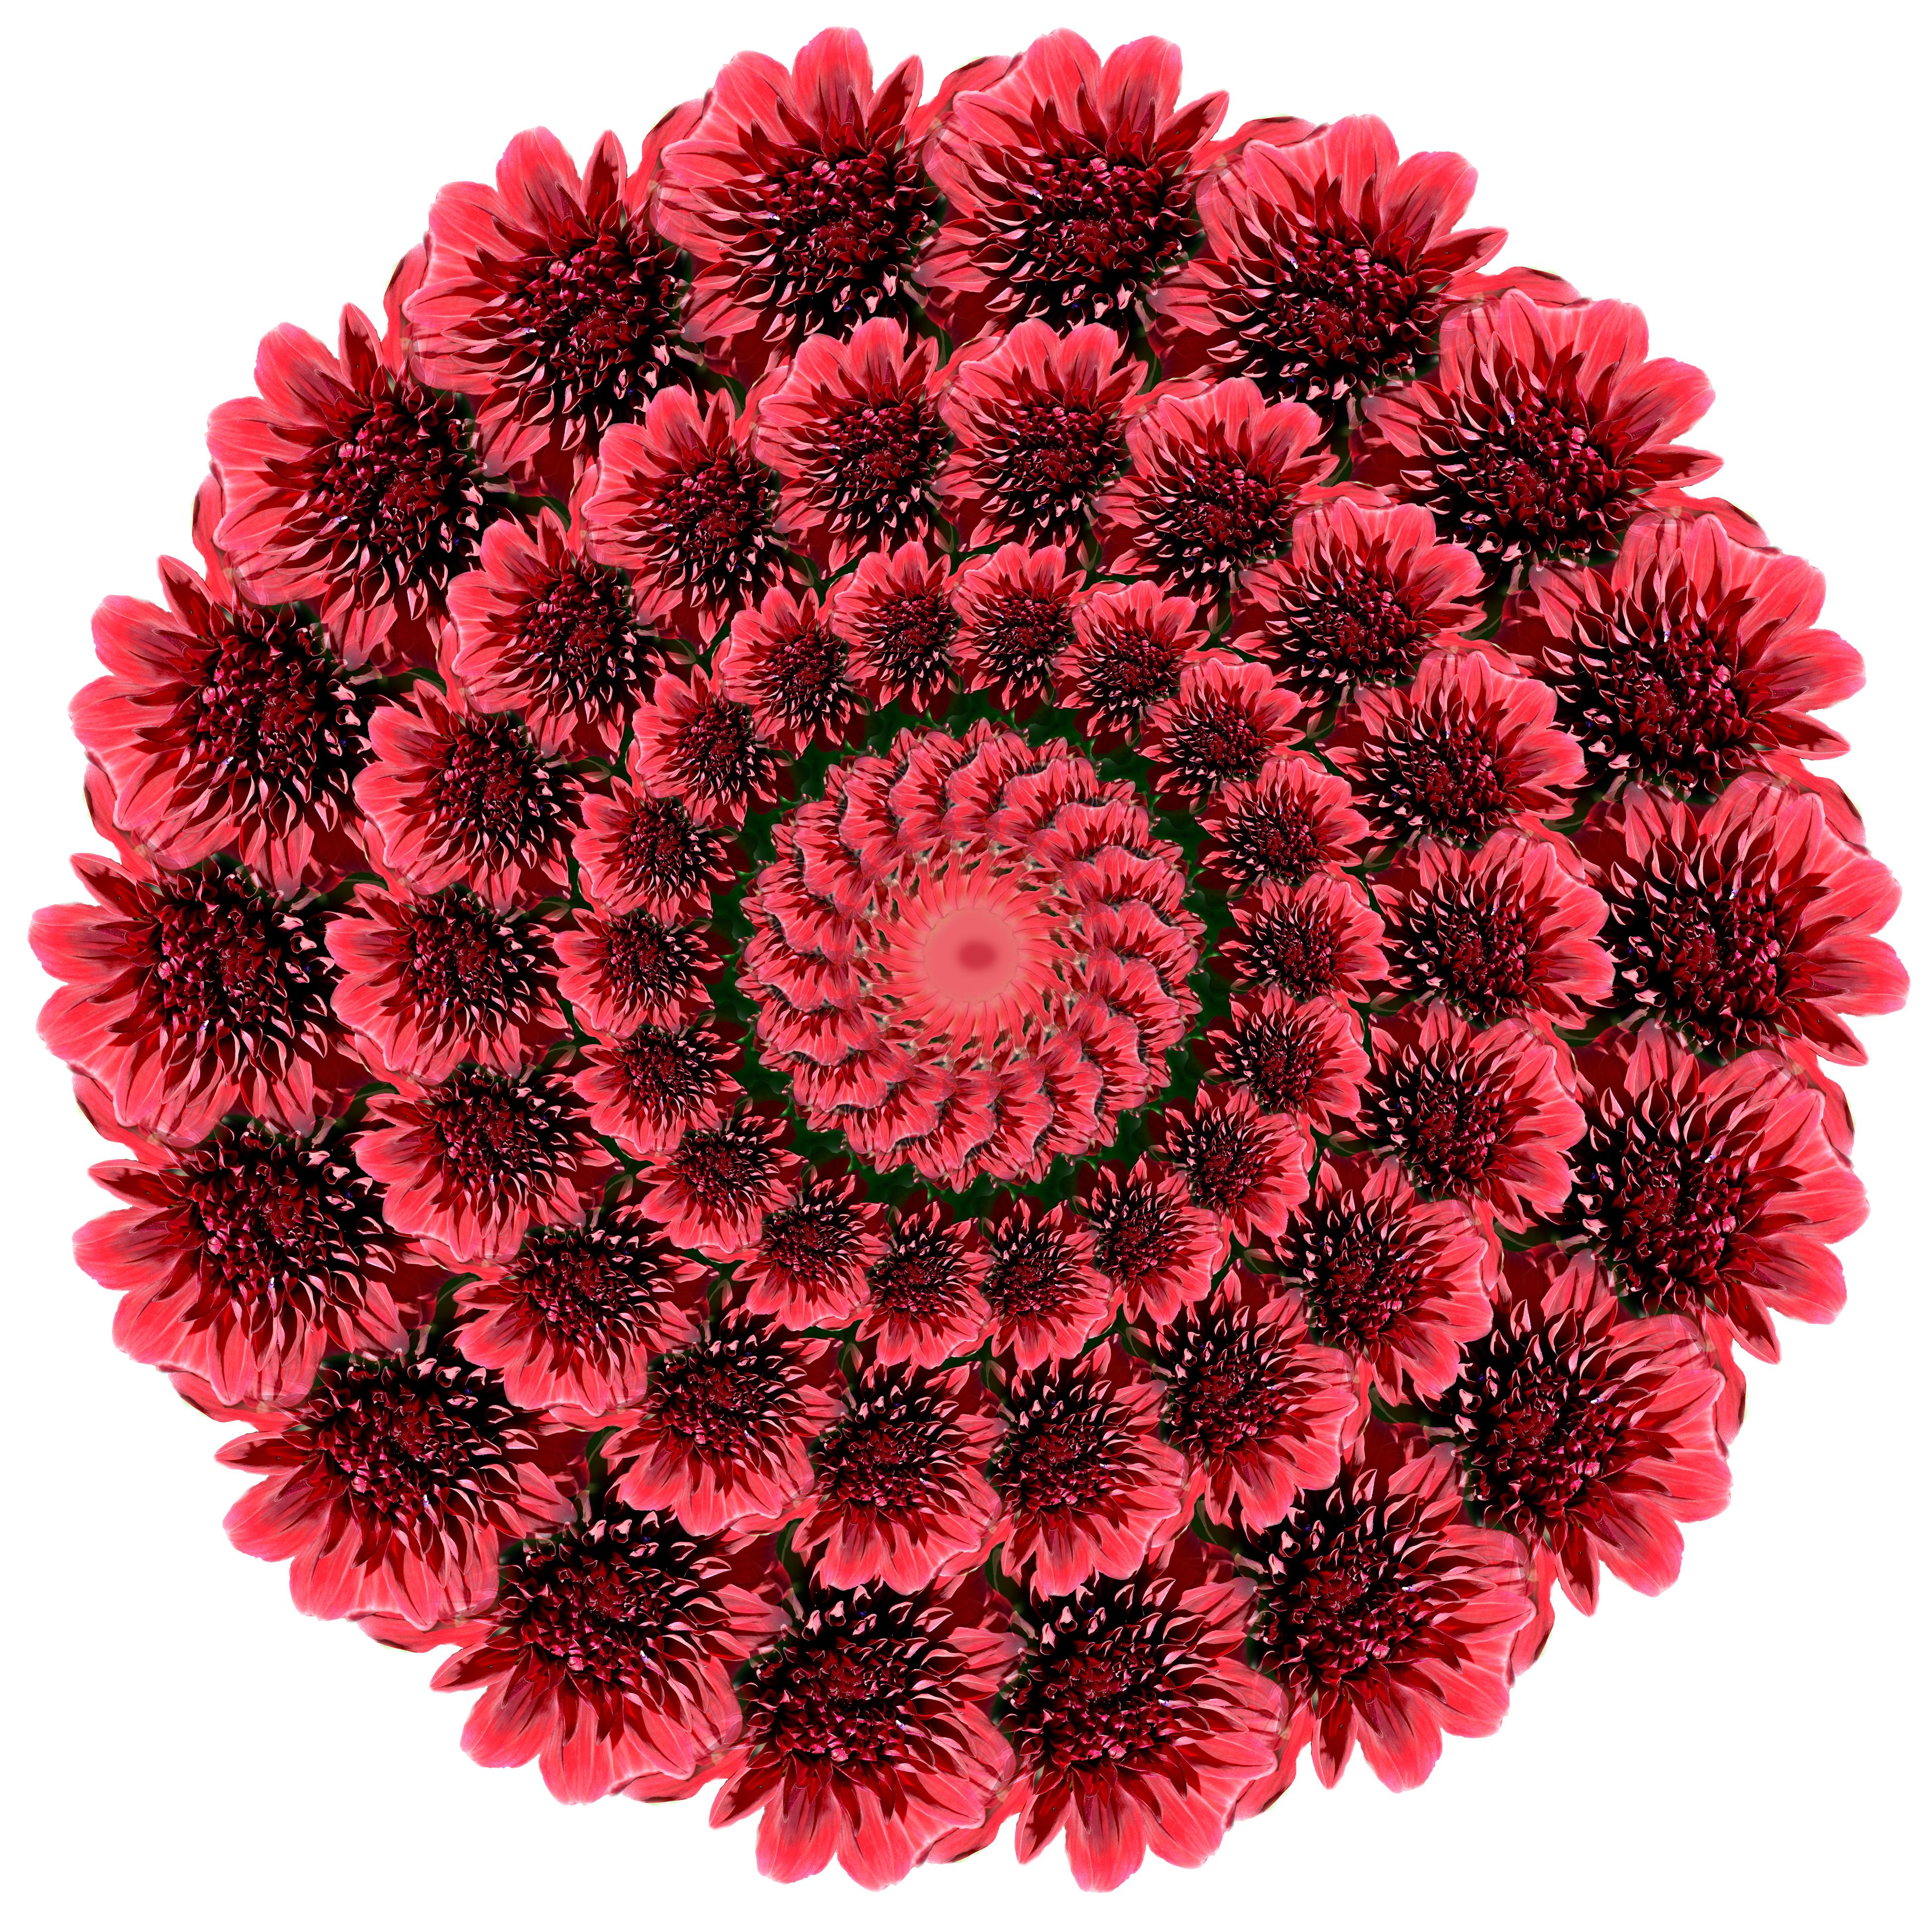 Olejarz_Harold_Flower4